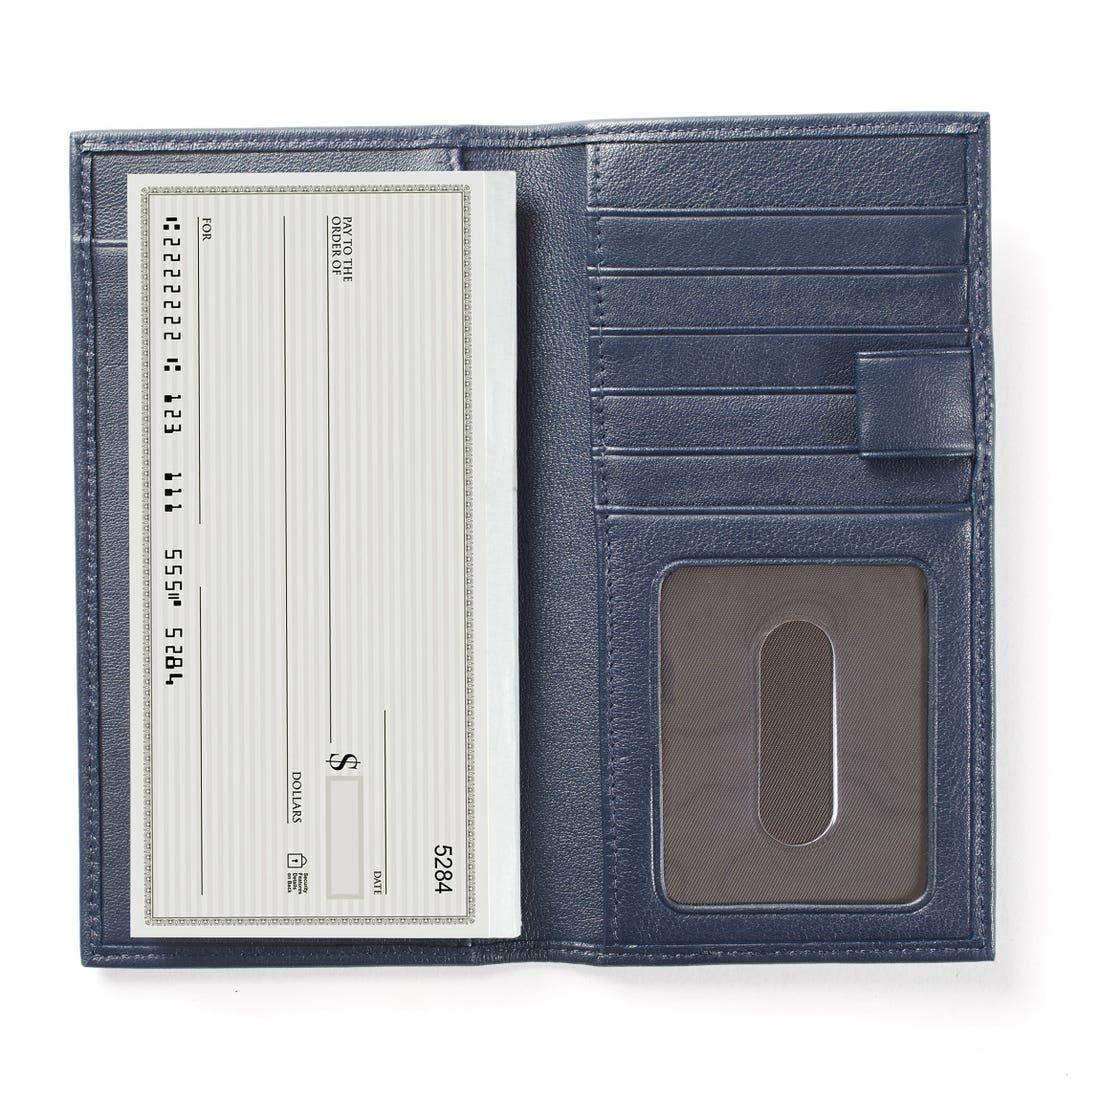 Checkbook & Card Holder with Divider